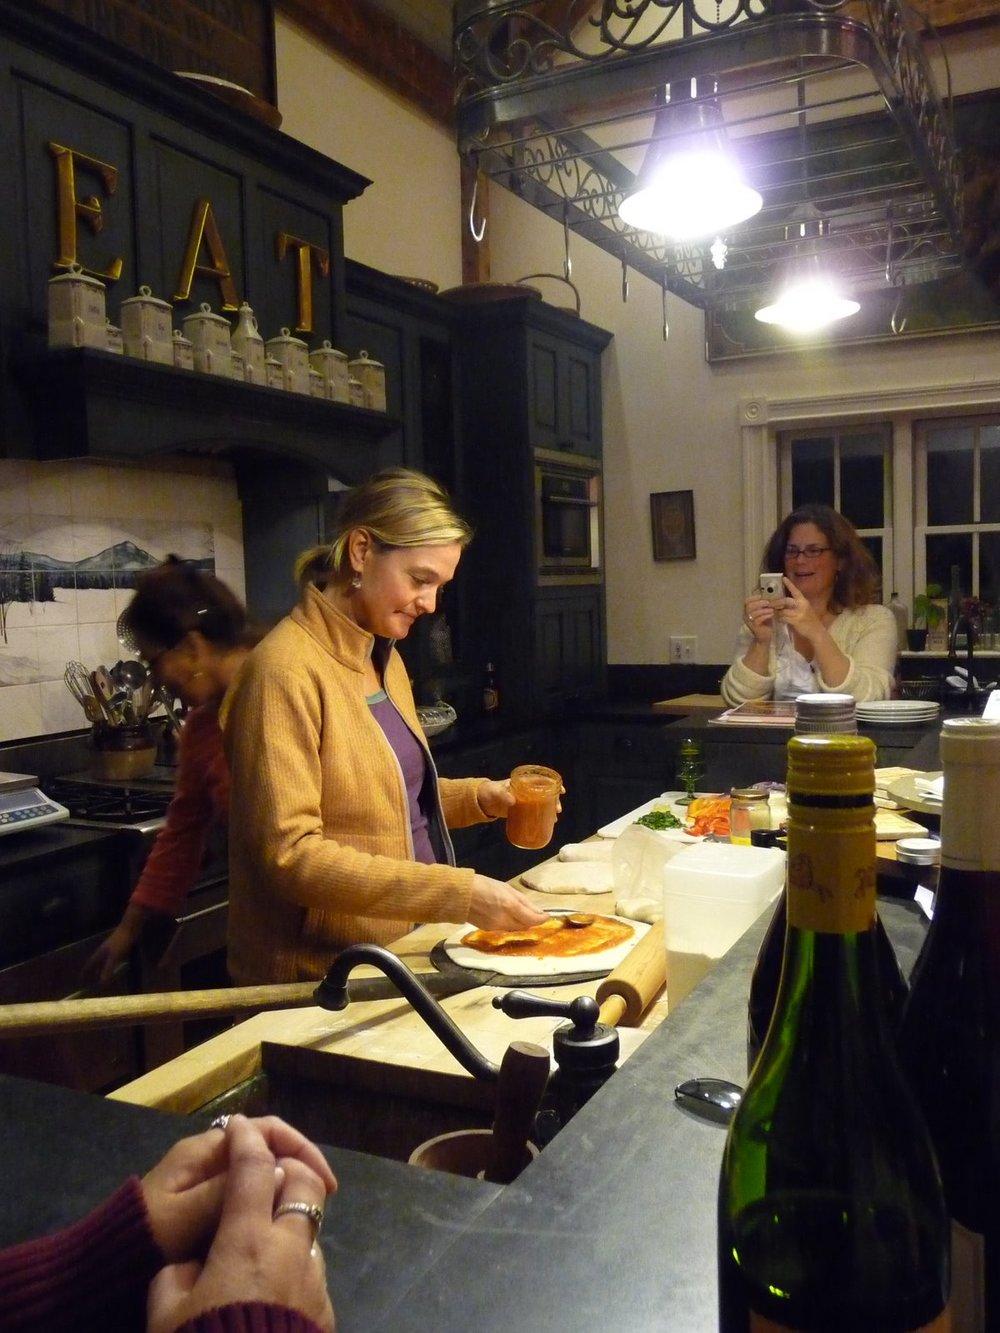 Dani_Coleman_making_pizza.JPG